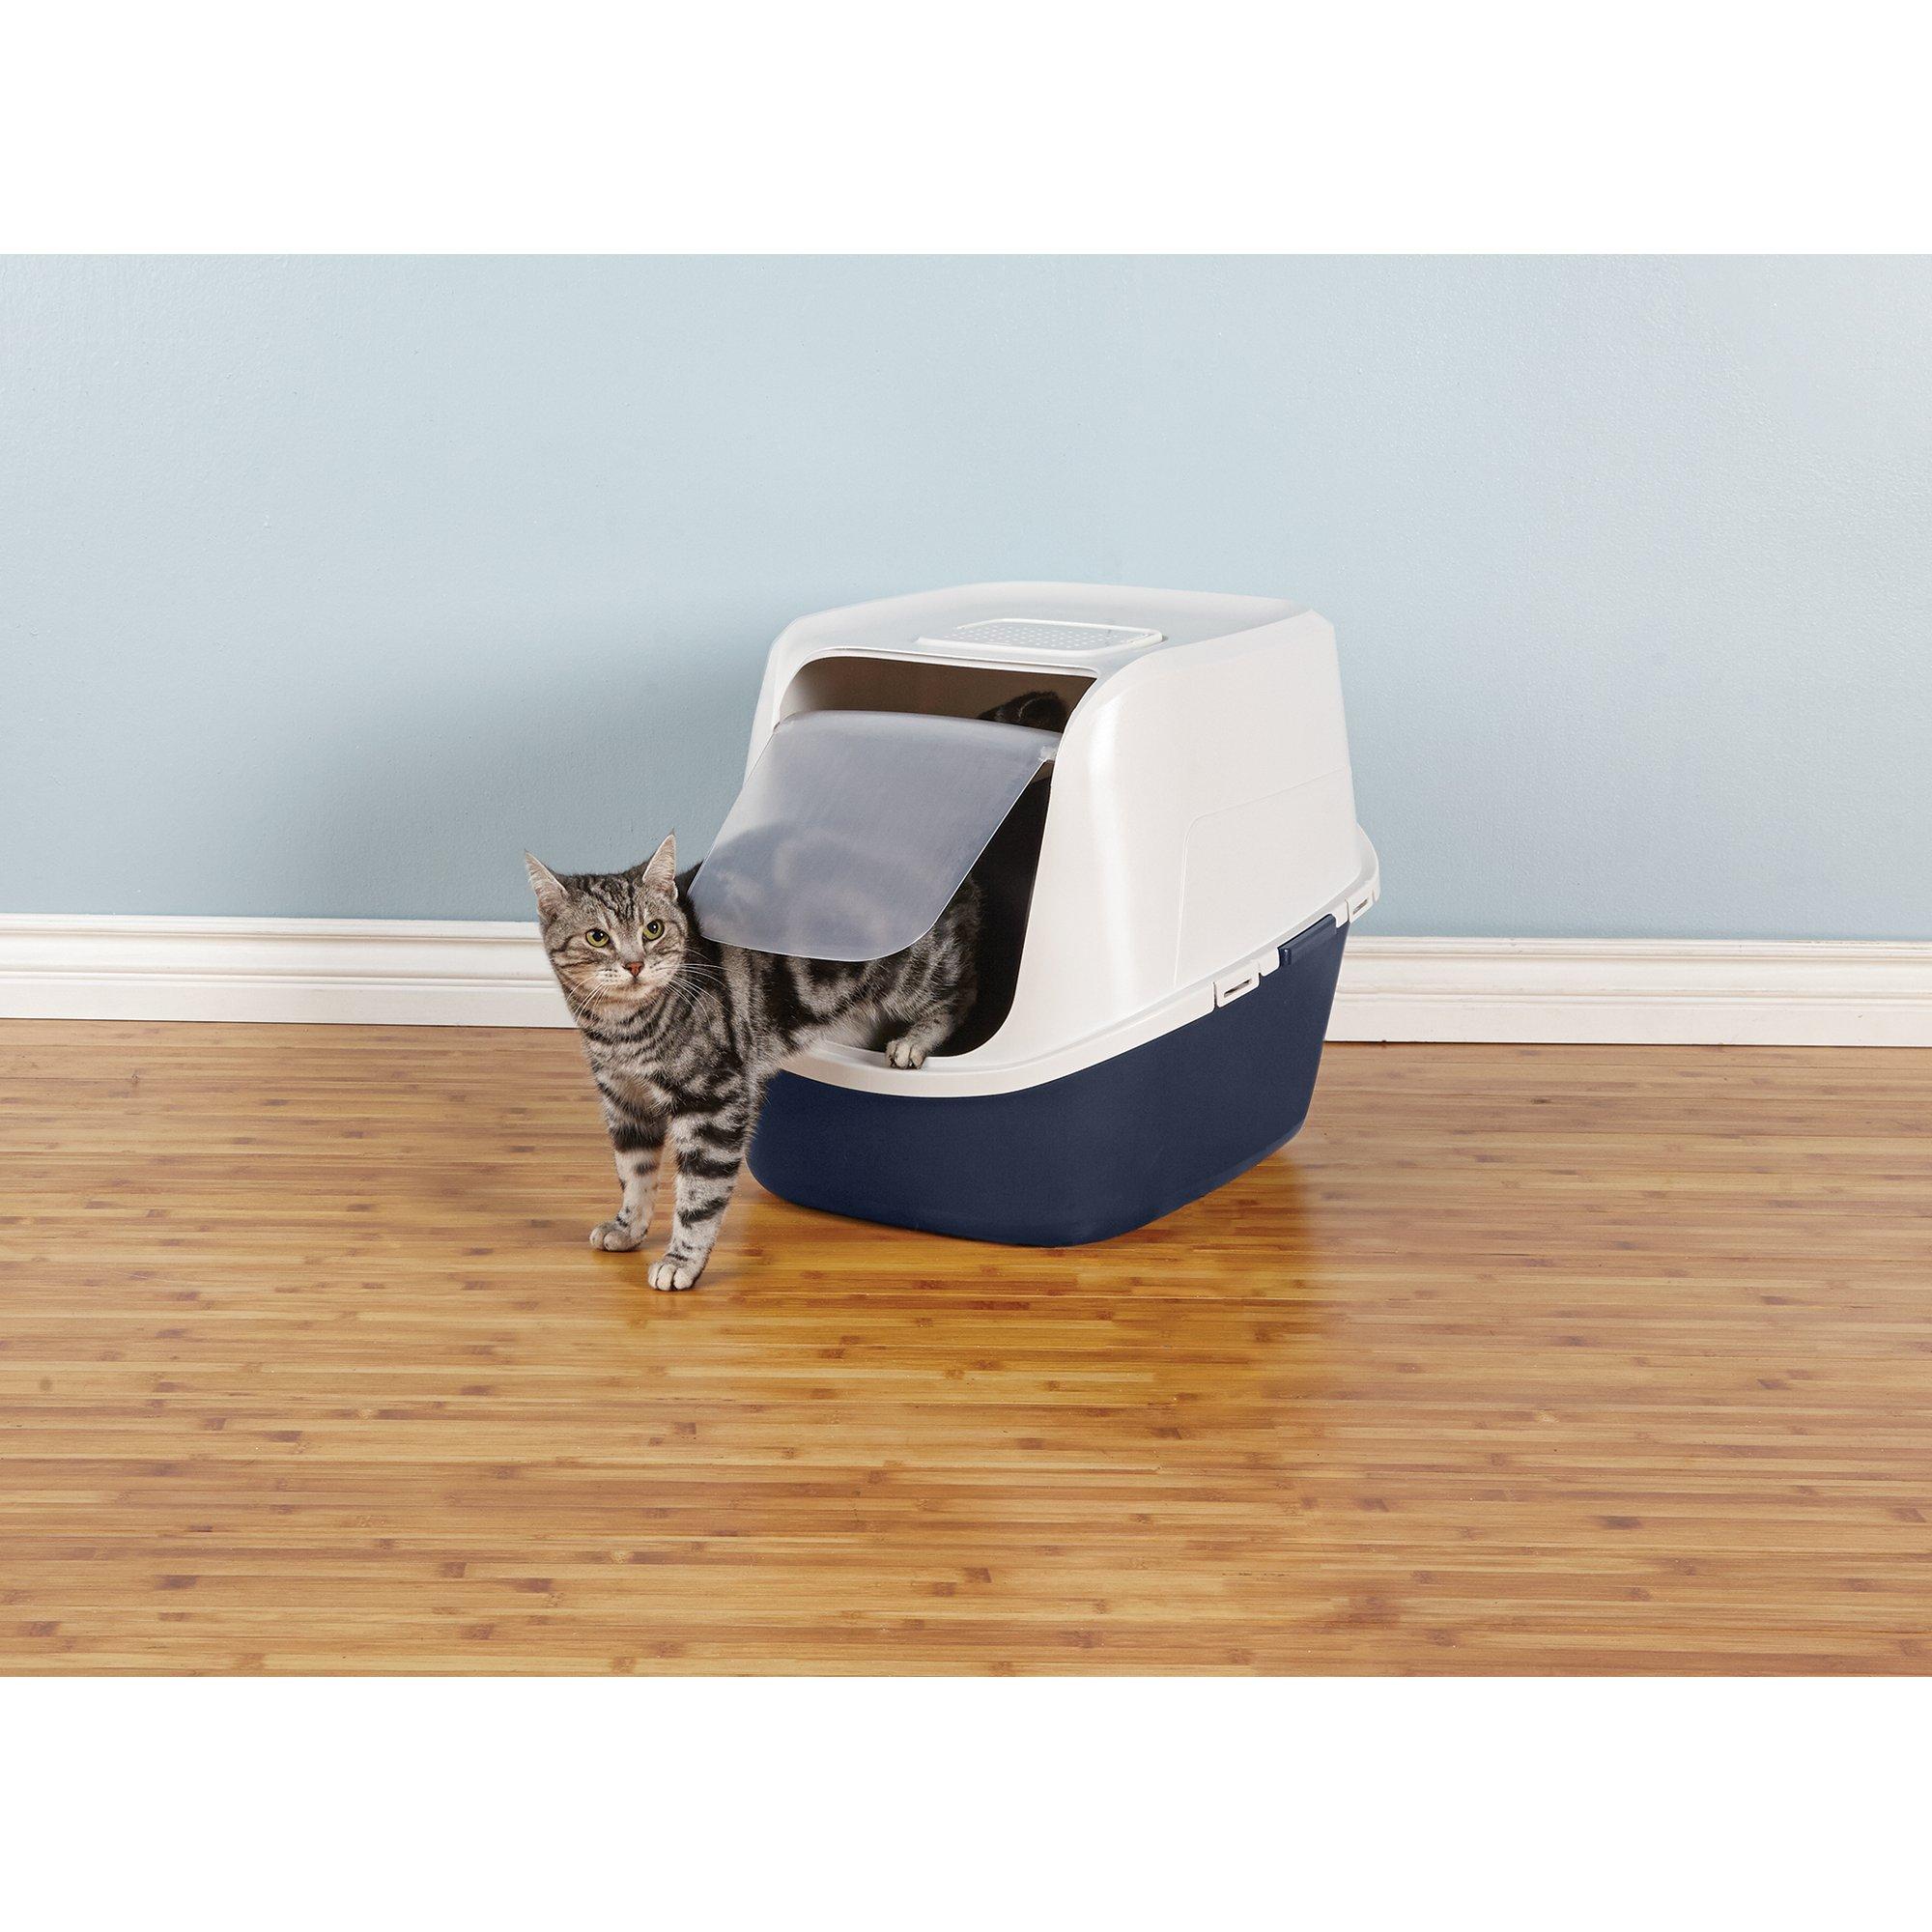 so phresh jumbo enclosed cat litter box in navy petco. Black Bedroom Furniture Sets. Home Design Ideas